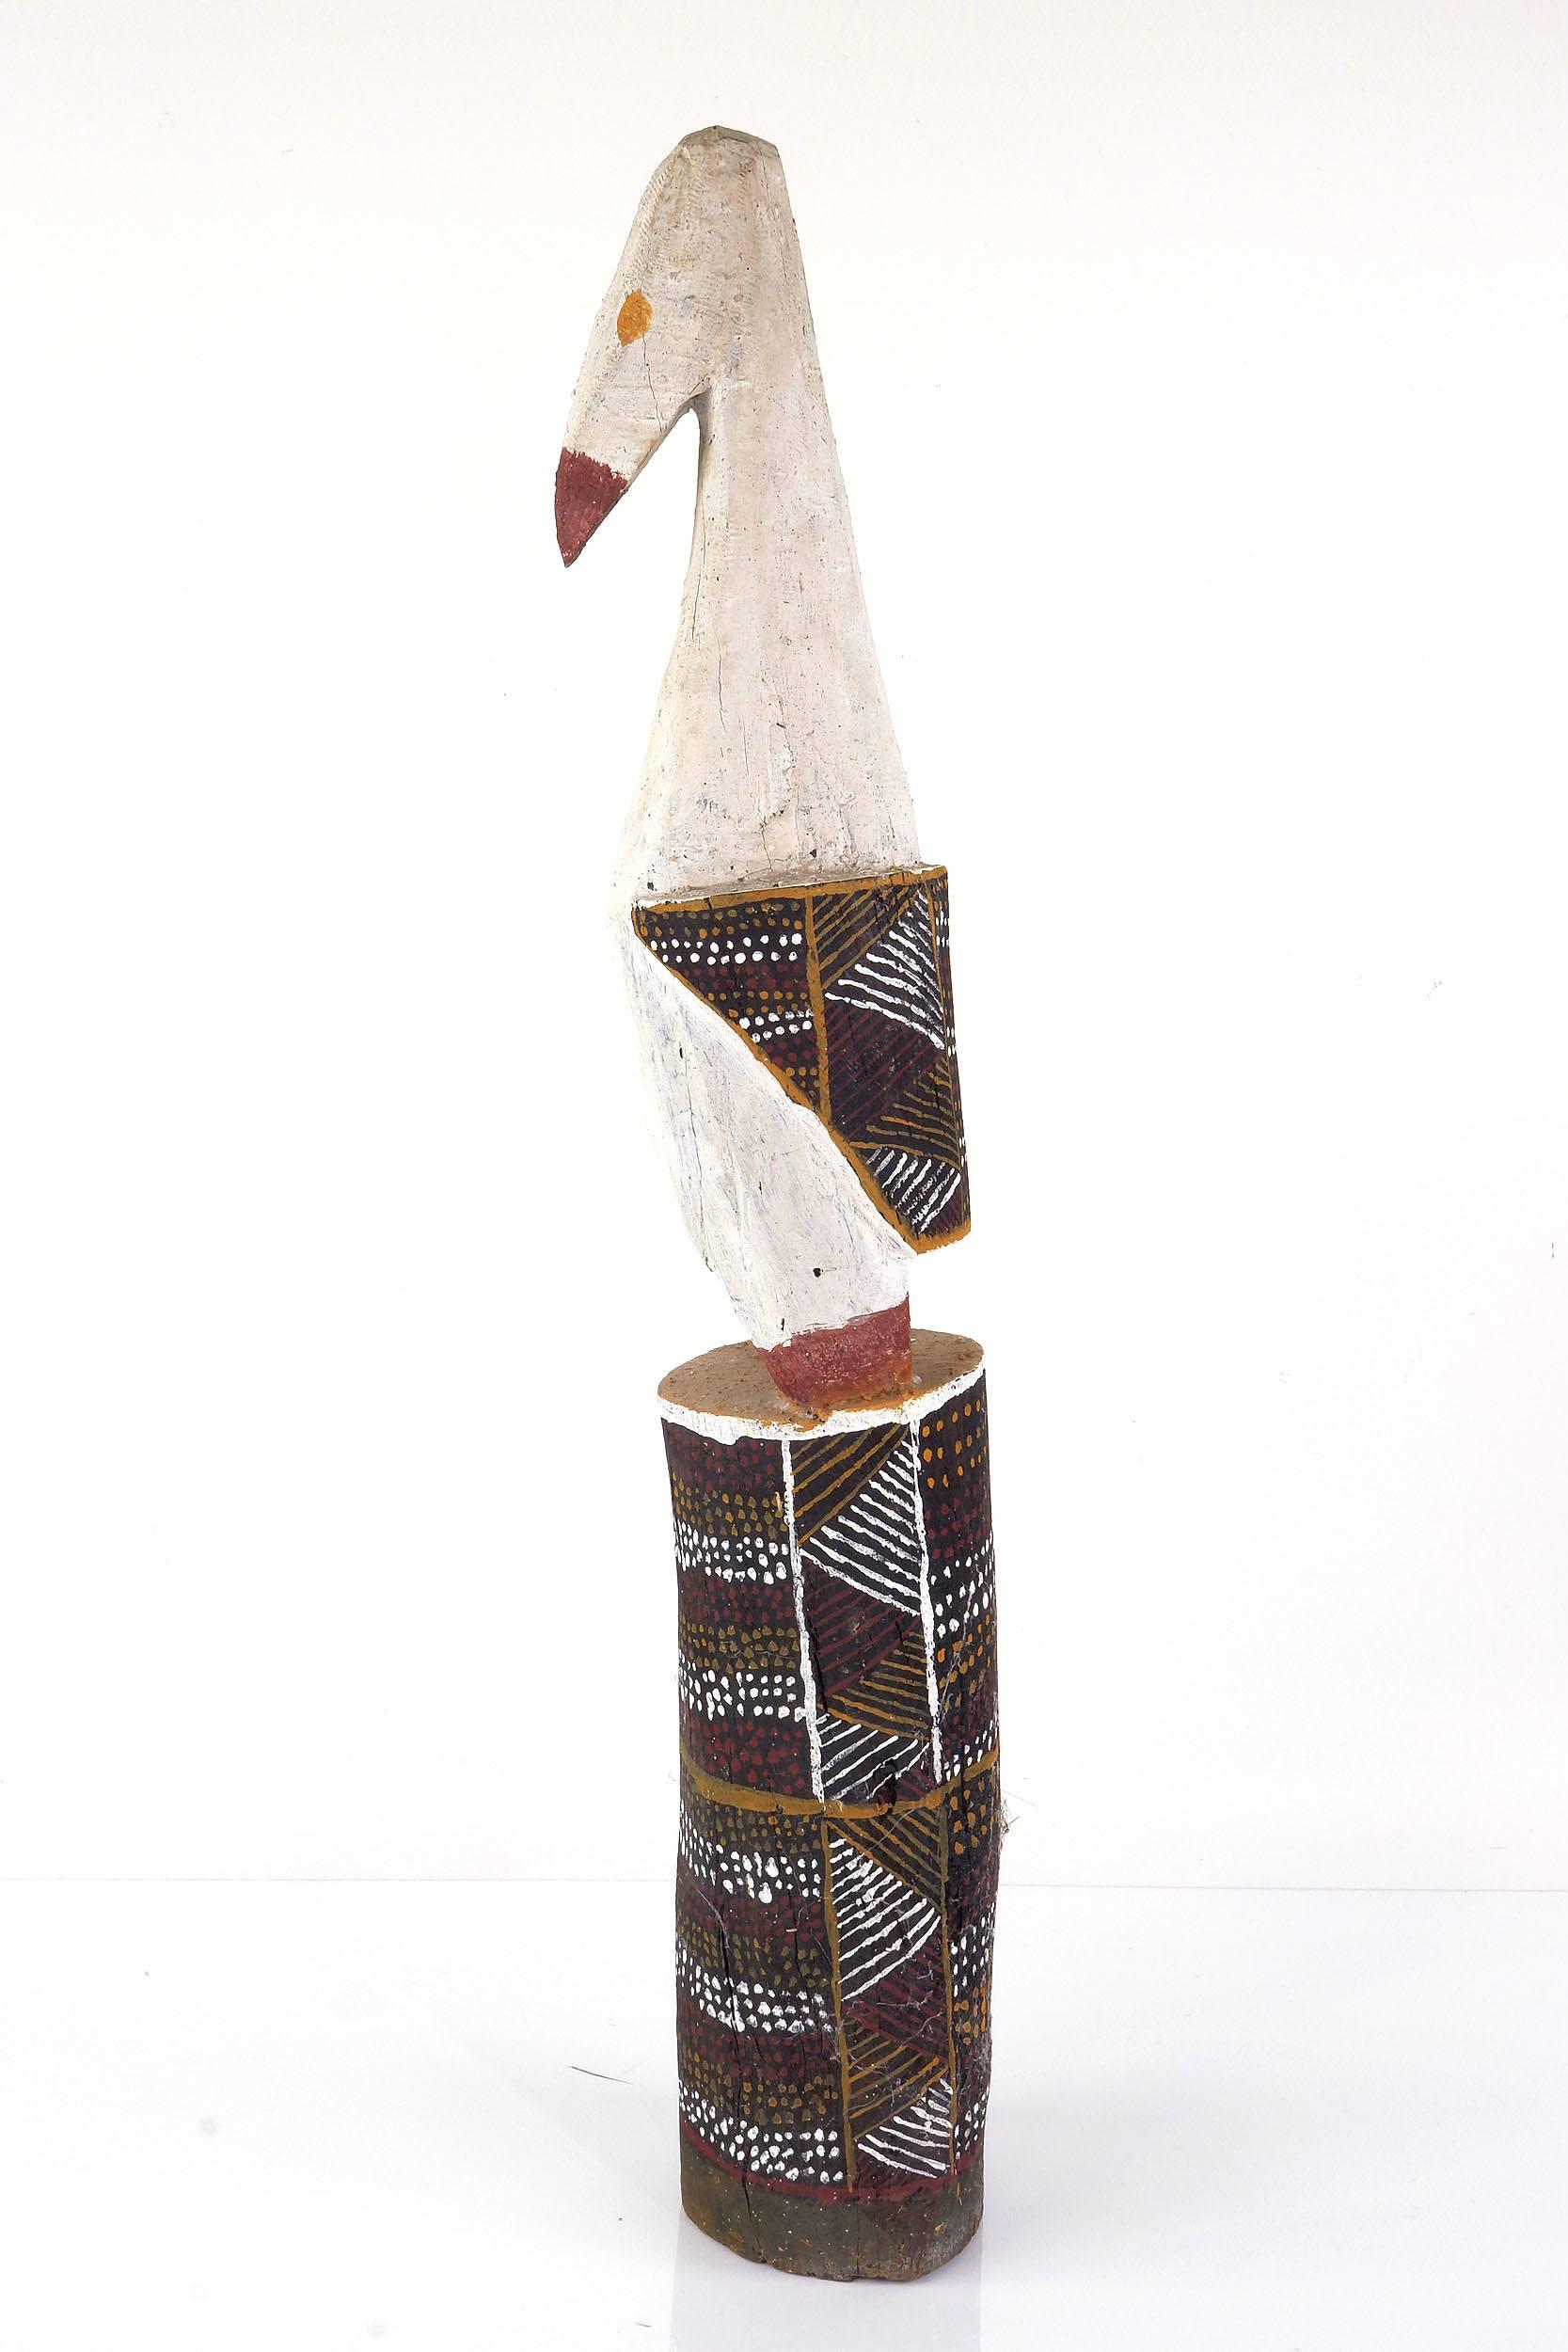 'Tiwi Islands, Bird, Carved Ironwood and Ochre'